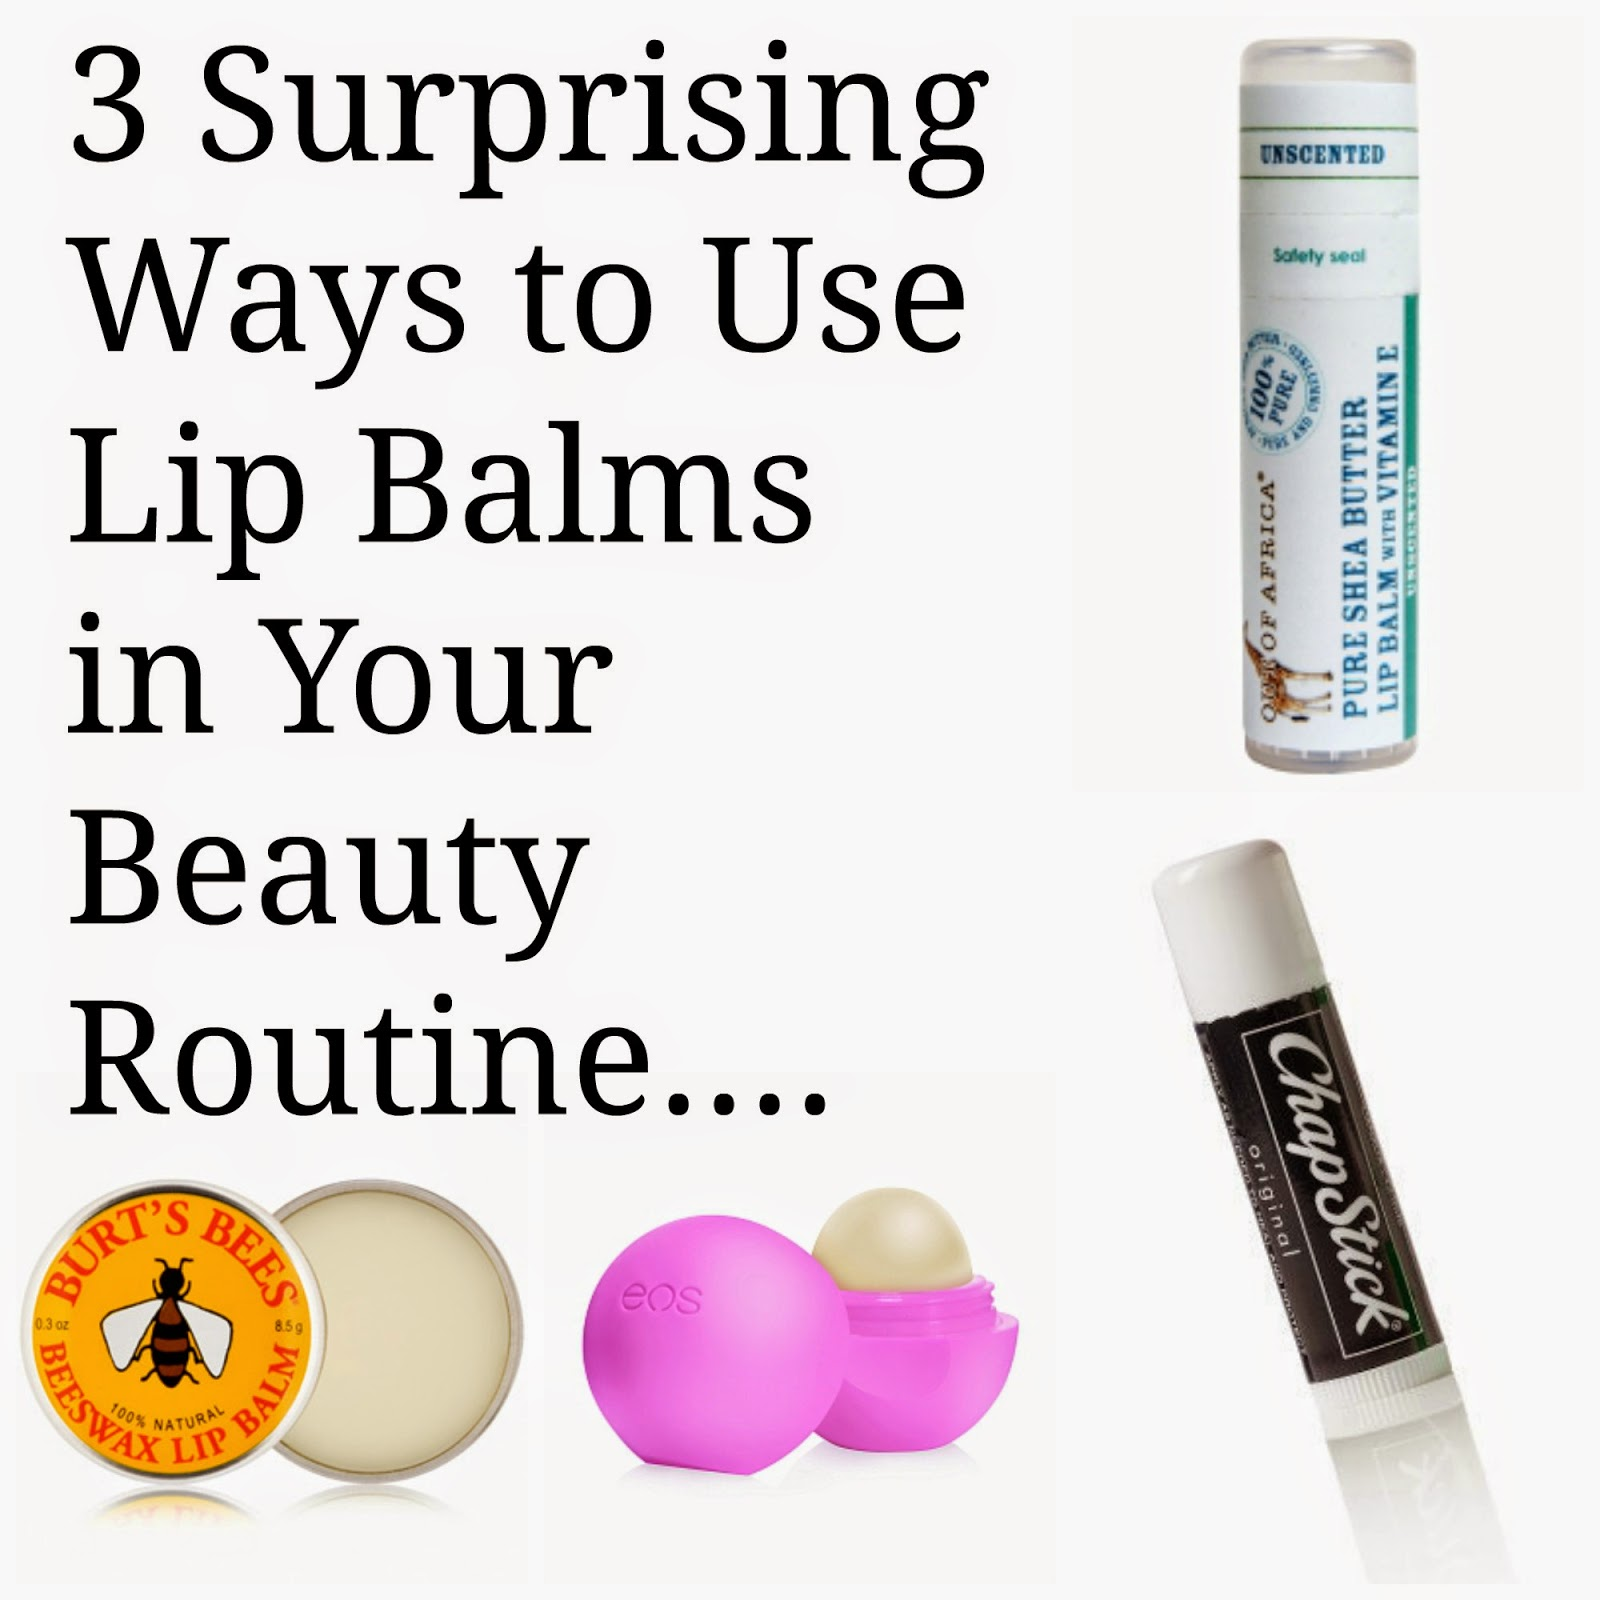 http://chrysalisglam101.blogspot.com/2014/09/3-surprising-ways-to-use-lip-balm-in.html